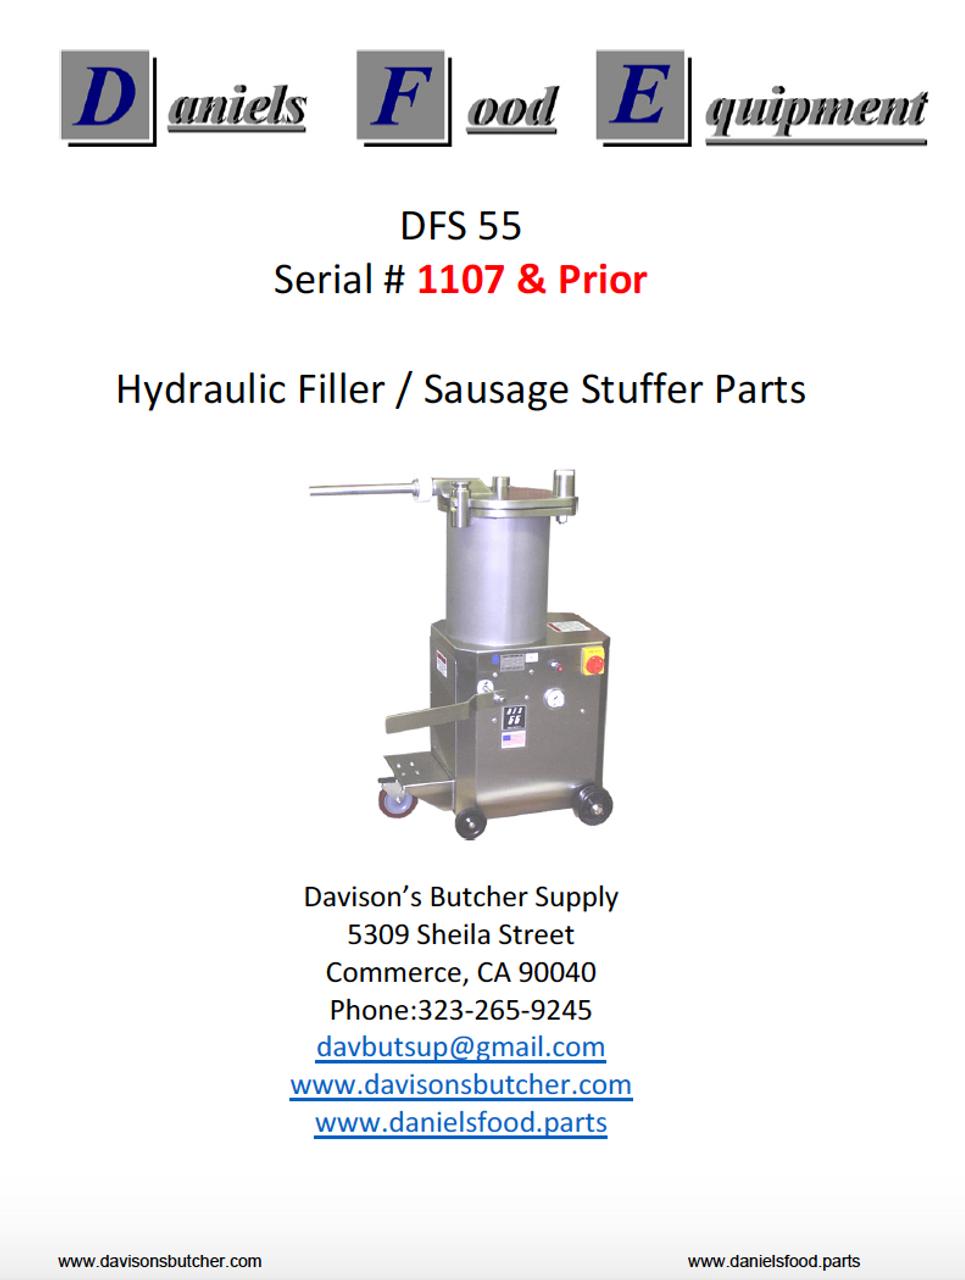 Daniels Food DFS 55 Sausage Stuffer / Filler  Parts - Parts List - Serial #1107 & Prior